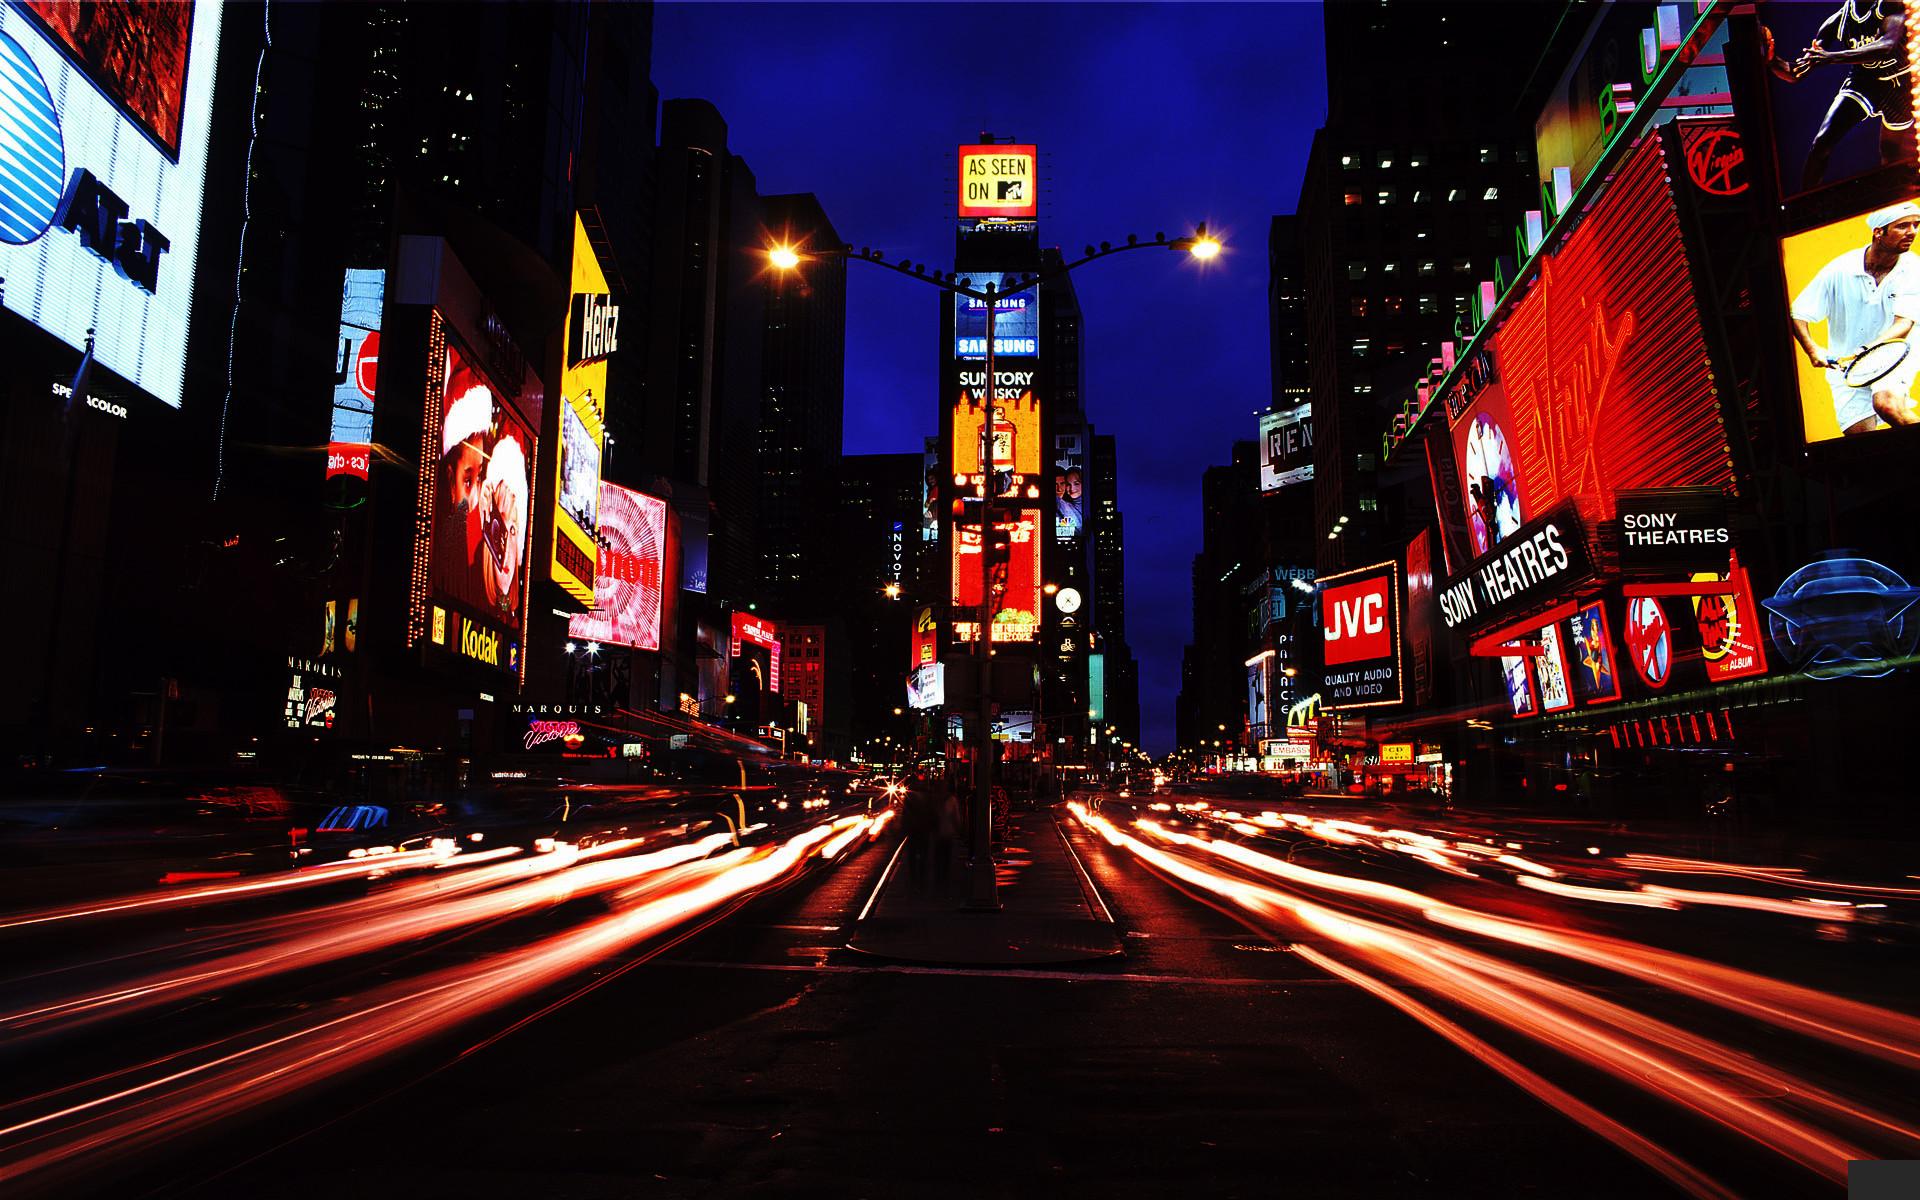 new-york-city-streets-at-night-wallpaper-3